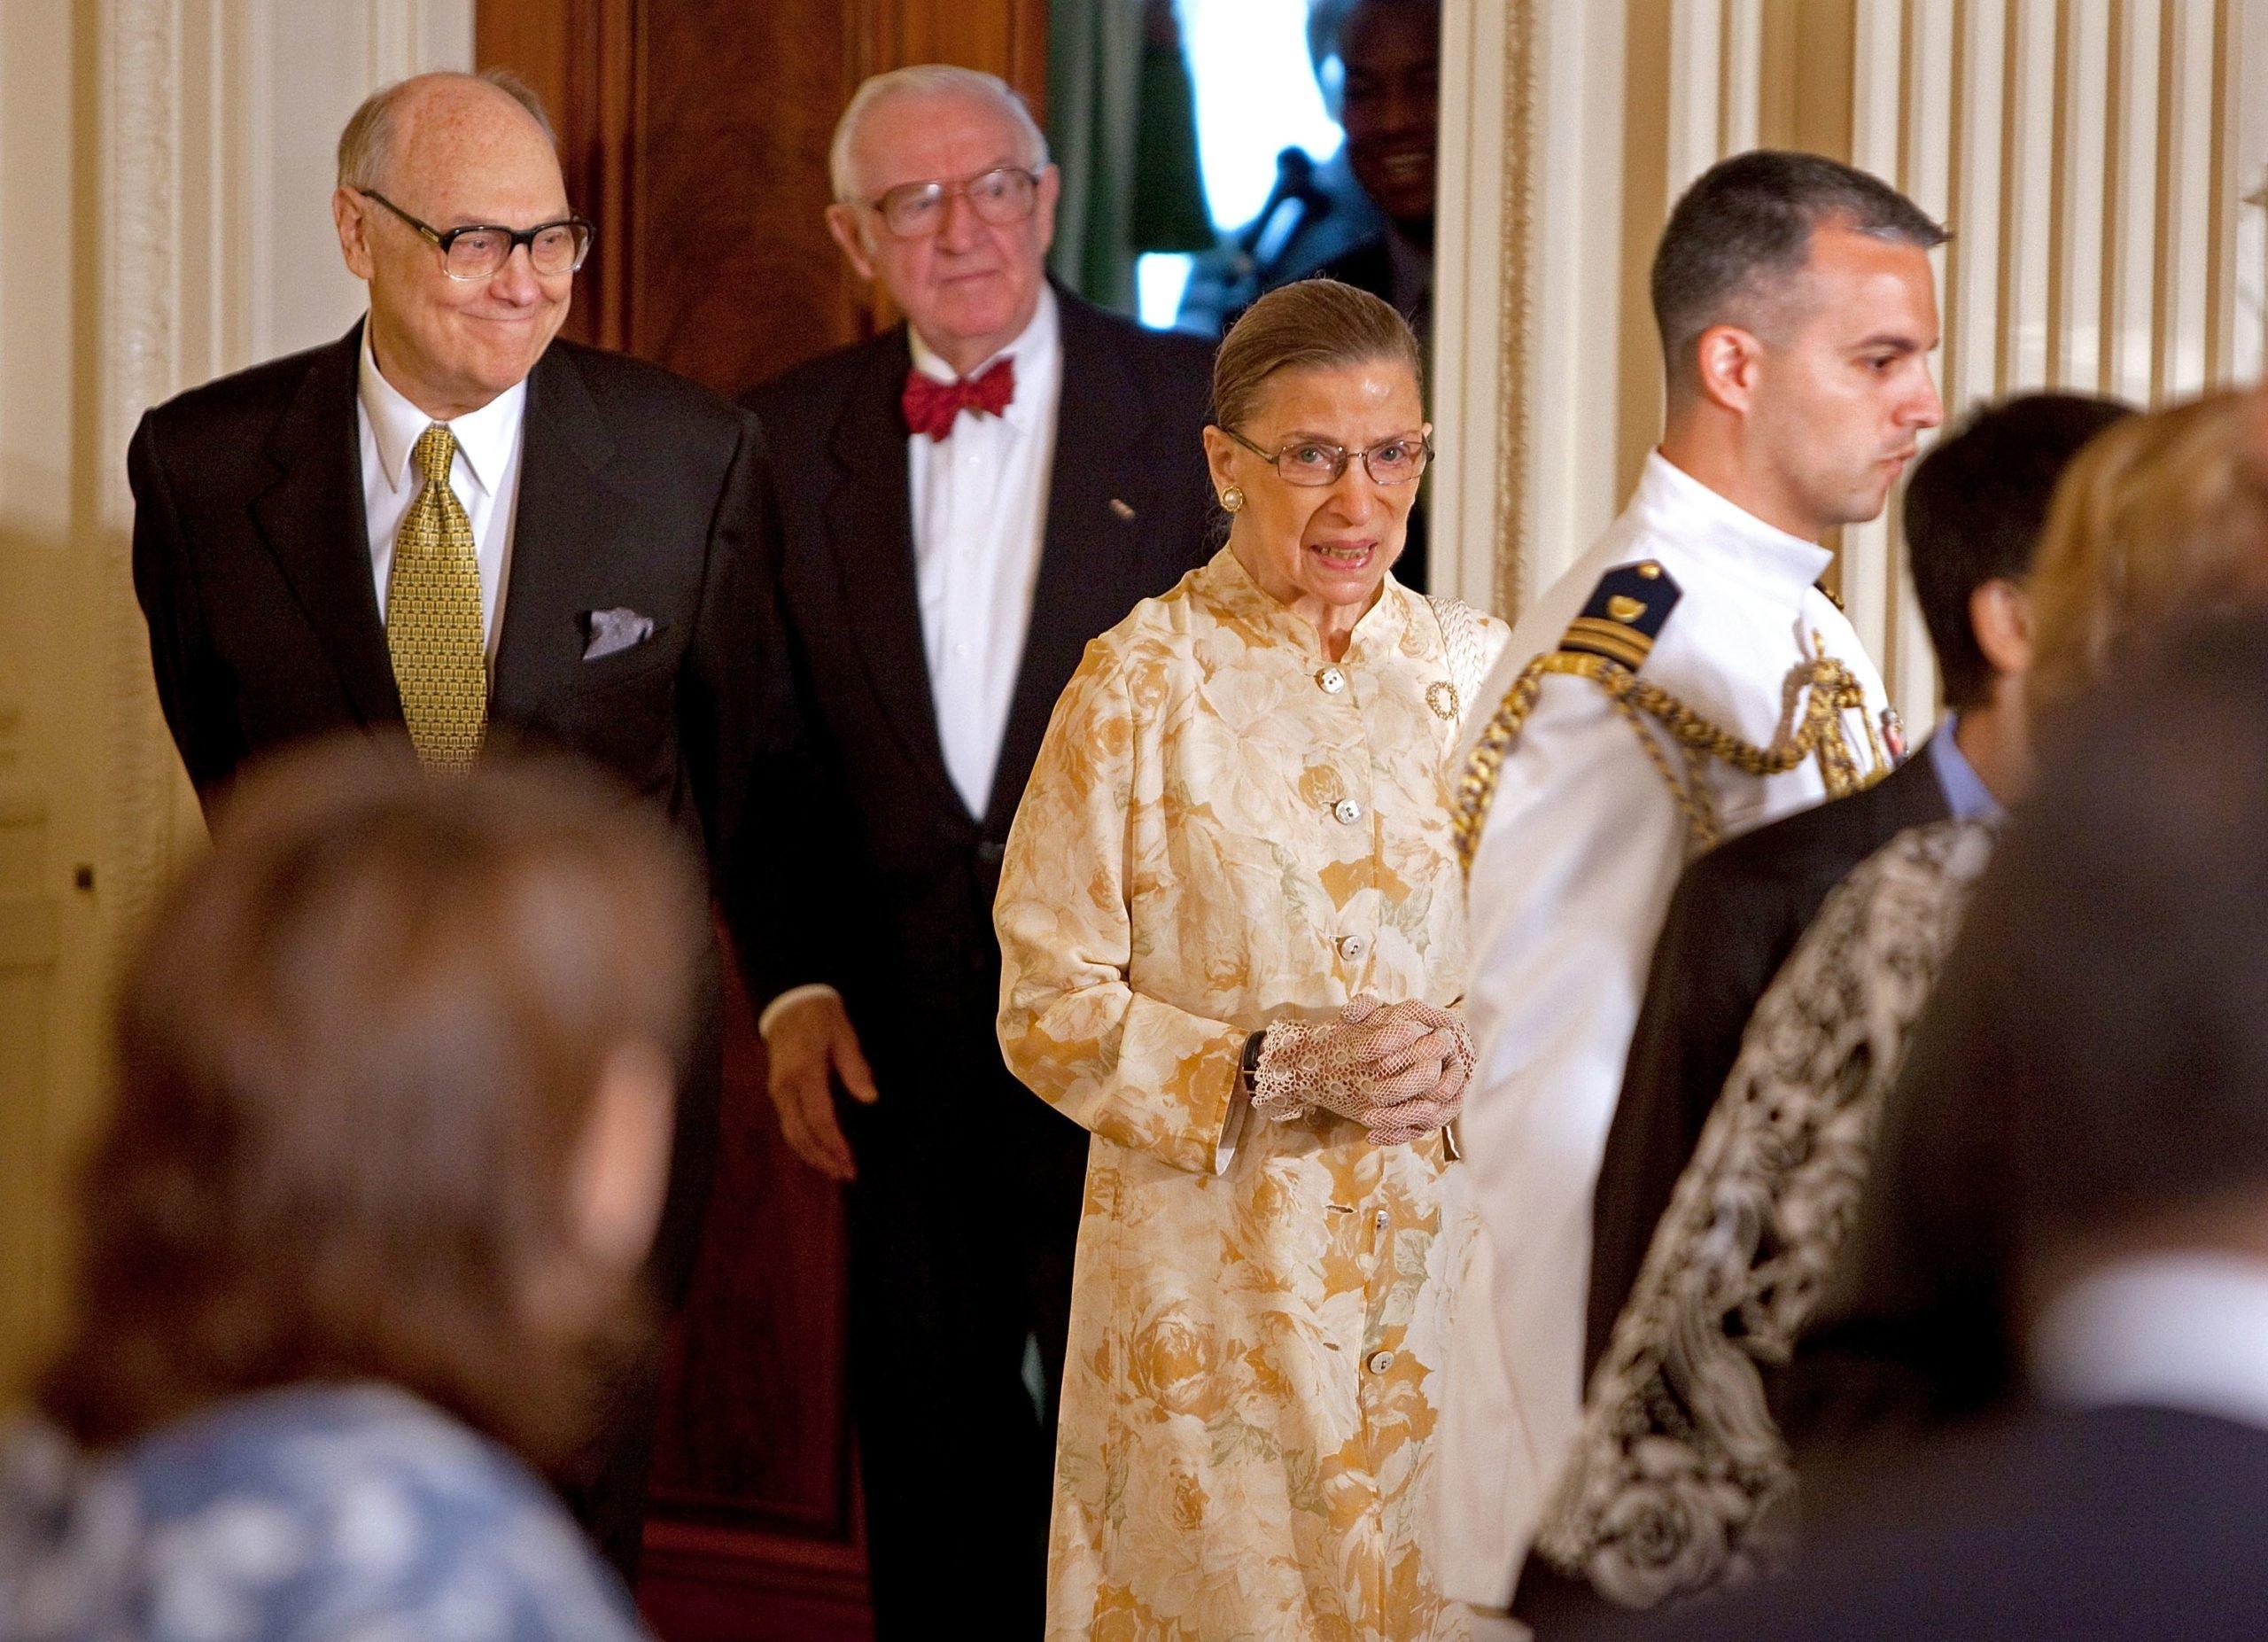 Obama Hosts Reception For New Supreme Court Justice Sonia Sotomayor